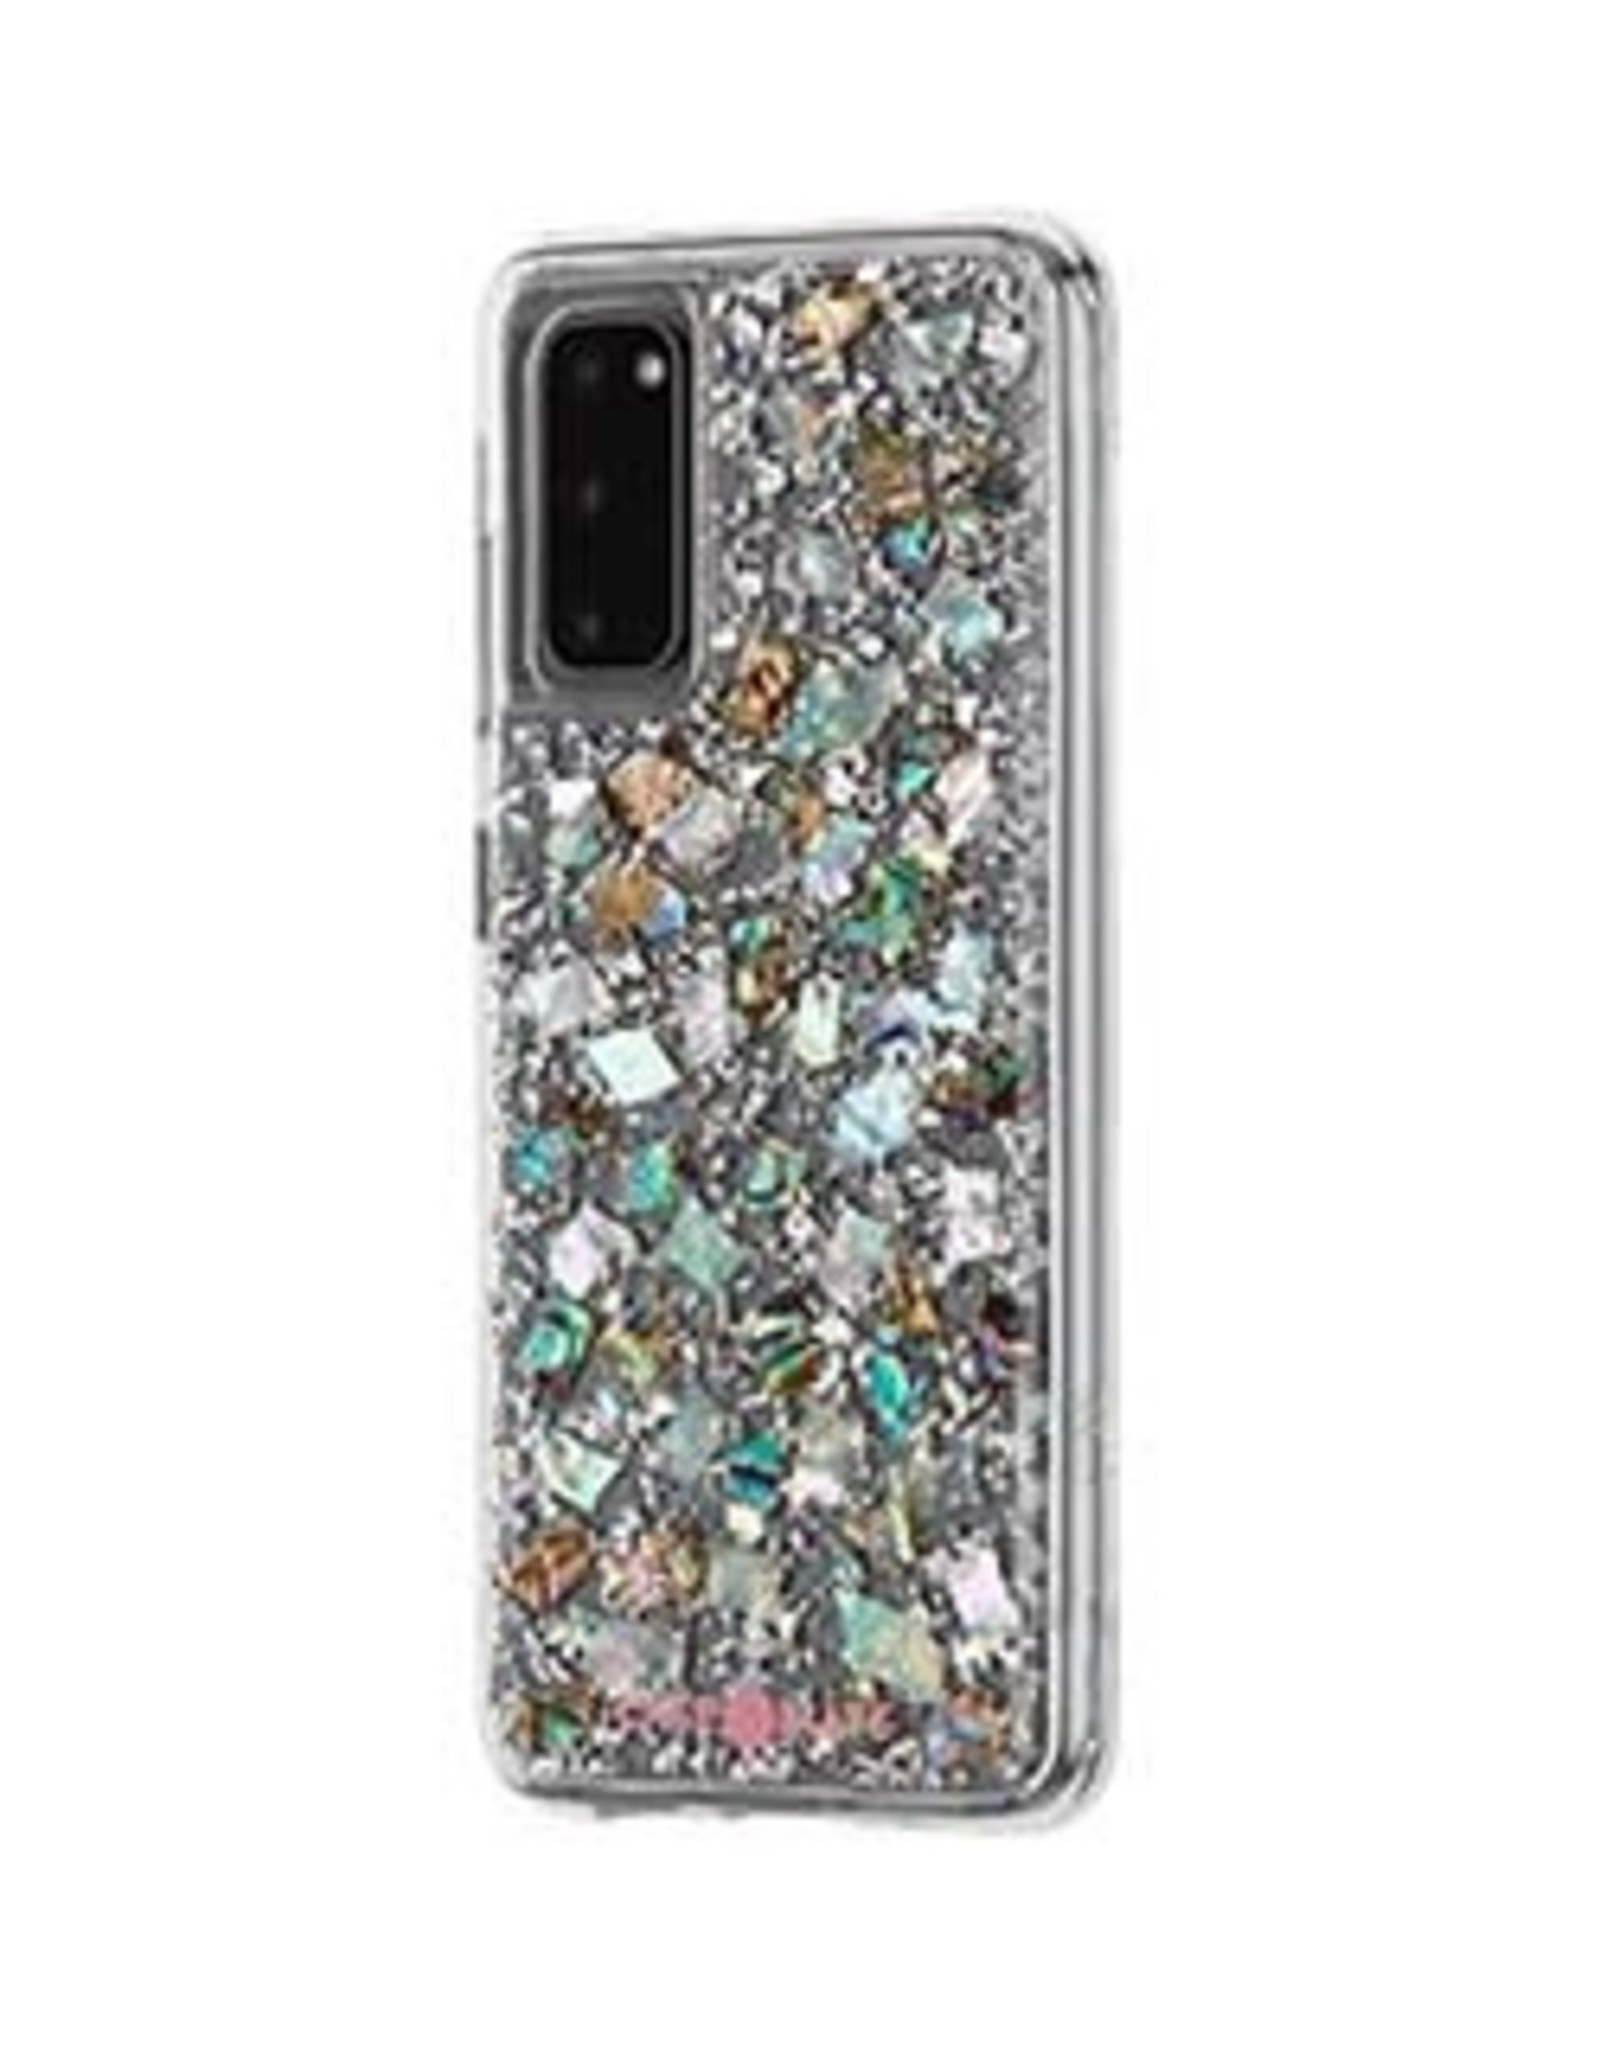 Case-Mate Case-Mate   Samsung Galaxy S20  Karat Pearl Case15-06661